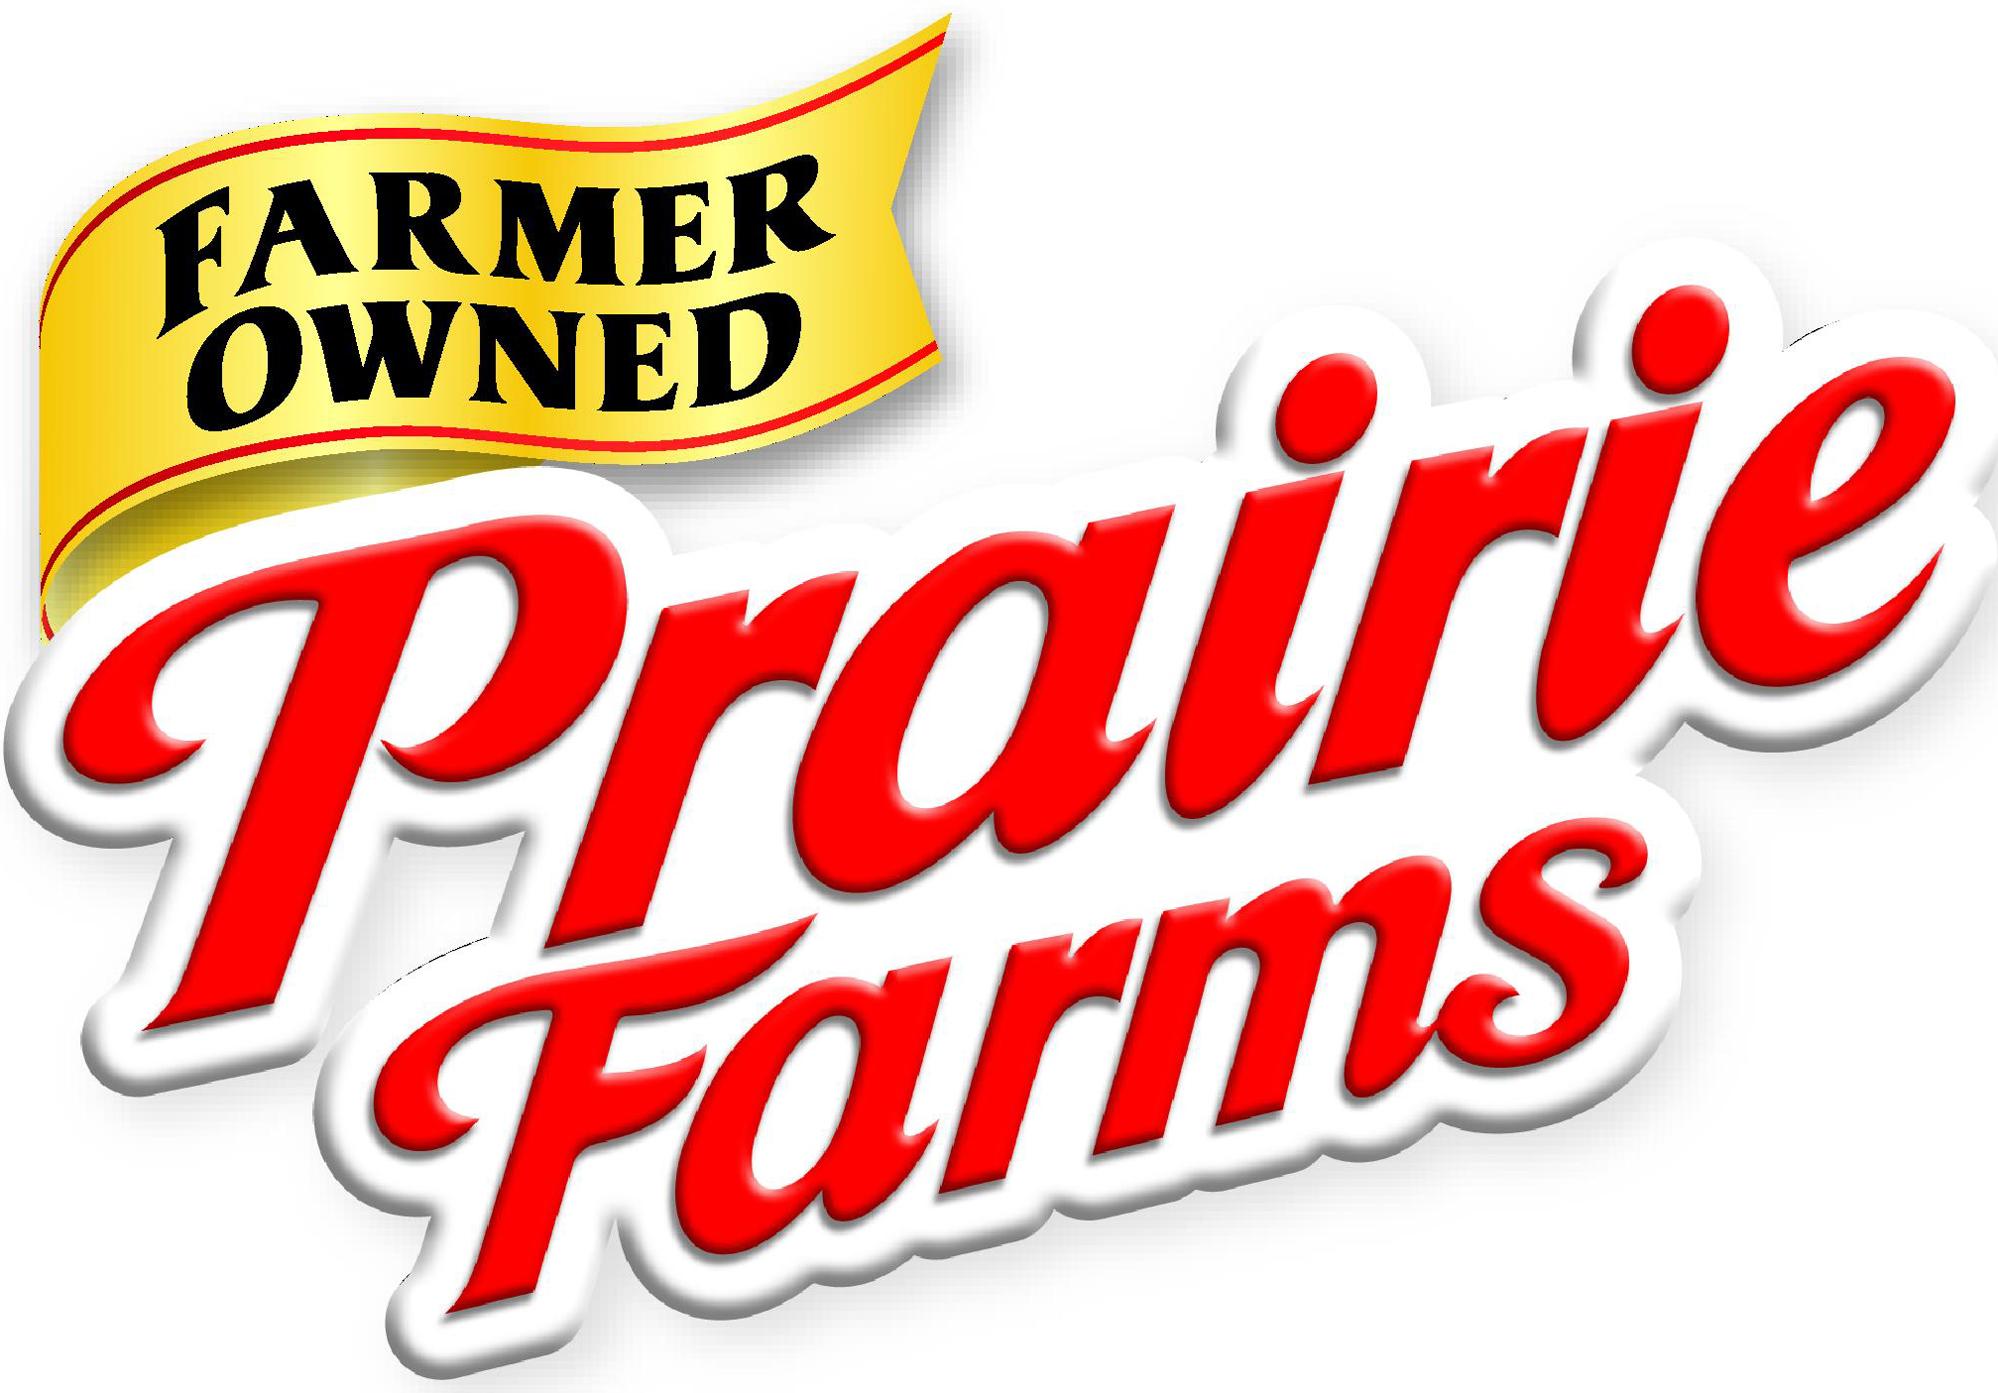 prairie farm singles over 50 Prairie farms announces new single with over 600 farm over 100 distribution facilities and annual sales of over $3 billion prairie farms is a.